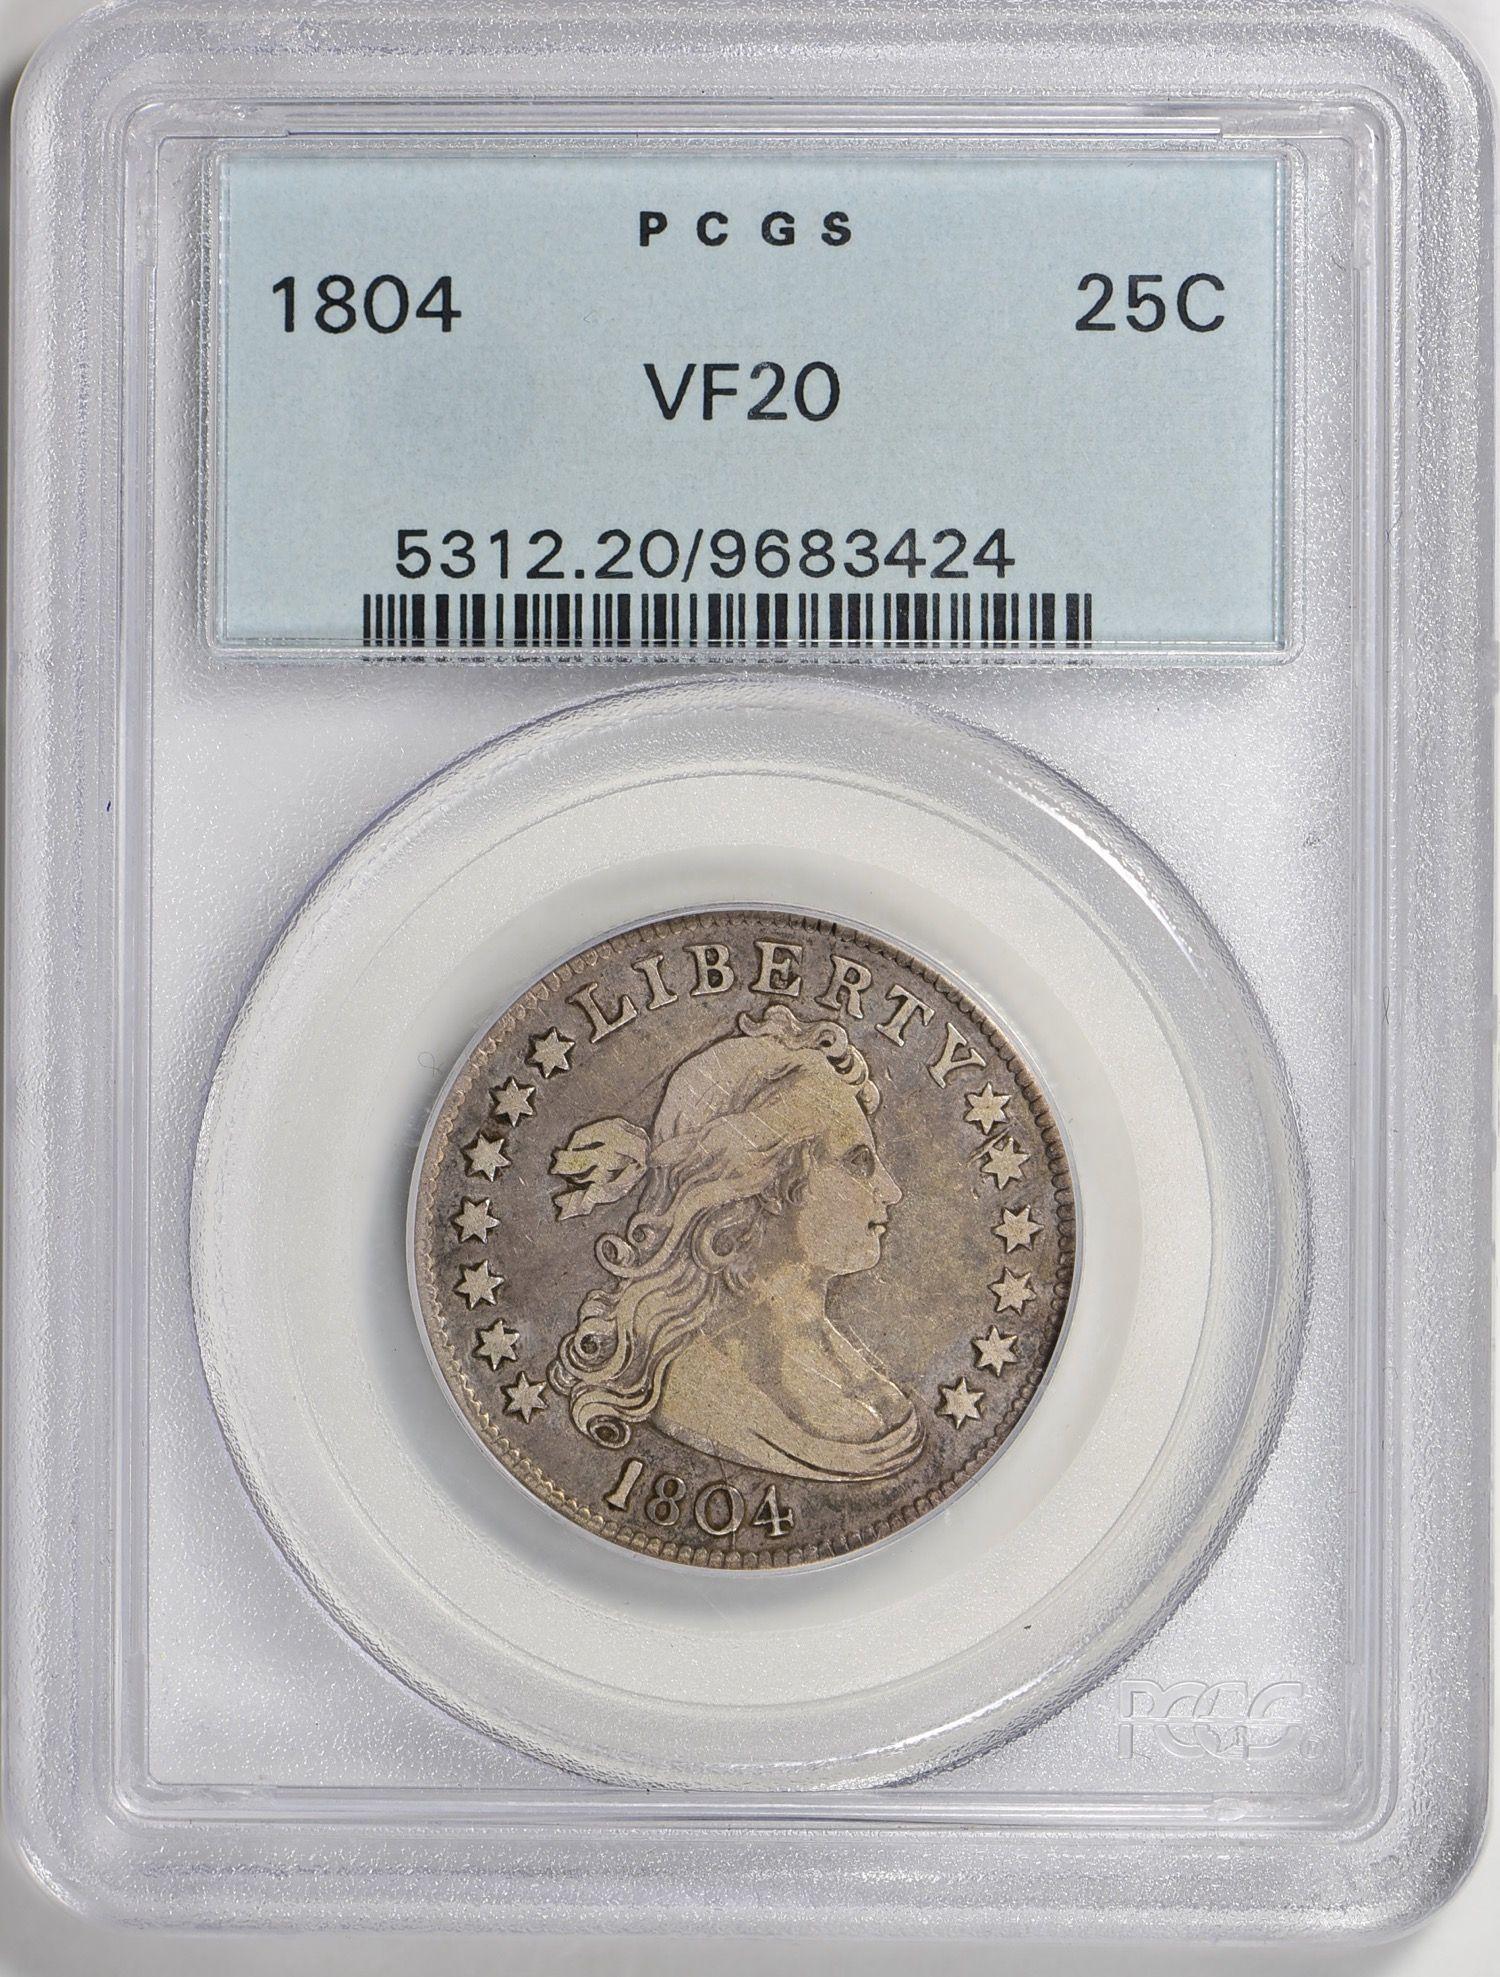 1804 Draped Bust Quarter Pcgs Vf 20 Ogh Quarterdollars Drapedbustquarters Pcgs Coins Coin Auctions Coins Pcgs